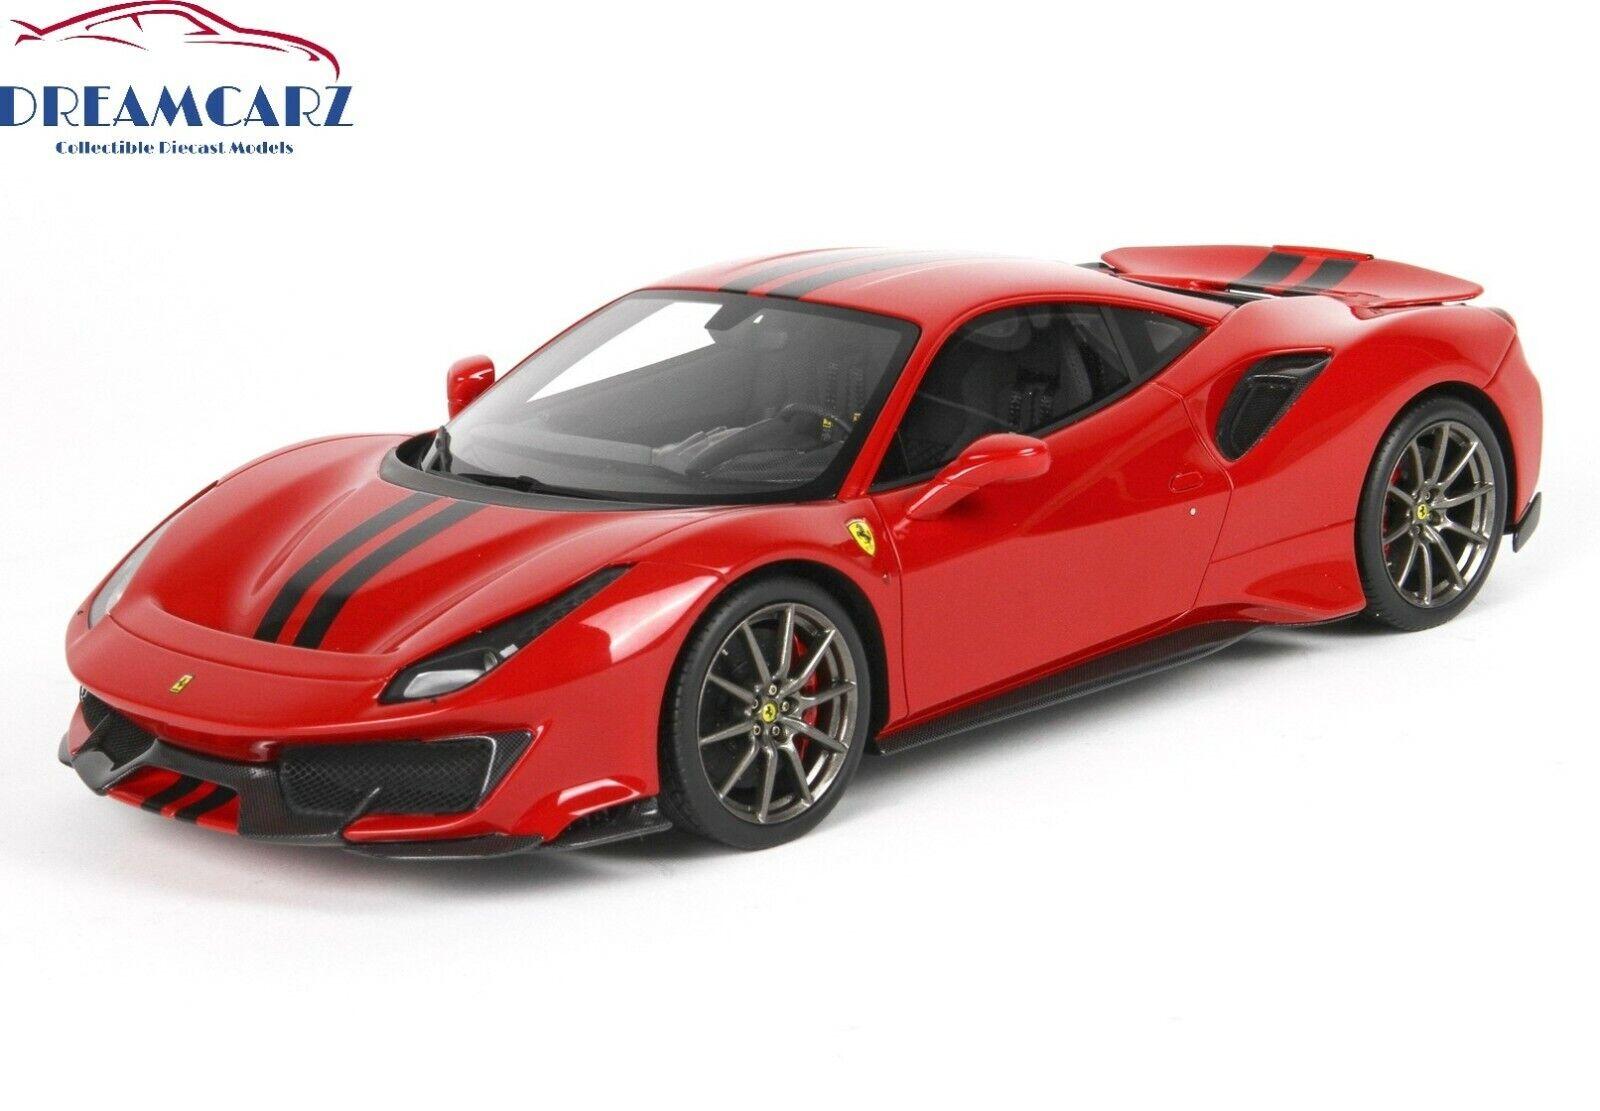 Bbr p18145 CFW 1   18 Ferrari 488 pista 2018 - muy pocas 32 ¡Bbr p18145 CFW 1   18 Ferrari 488 pista 2018 - muy pocas 32